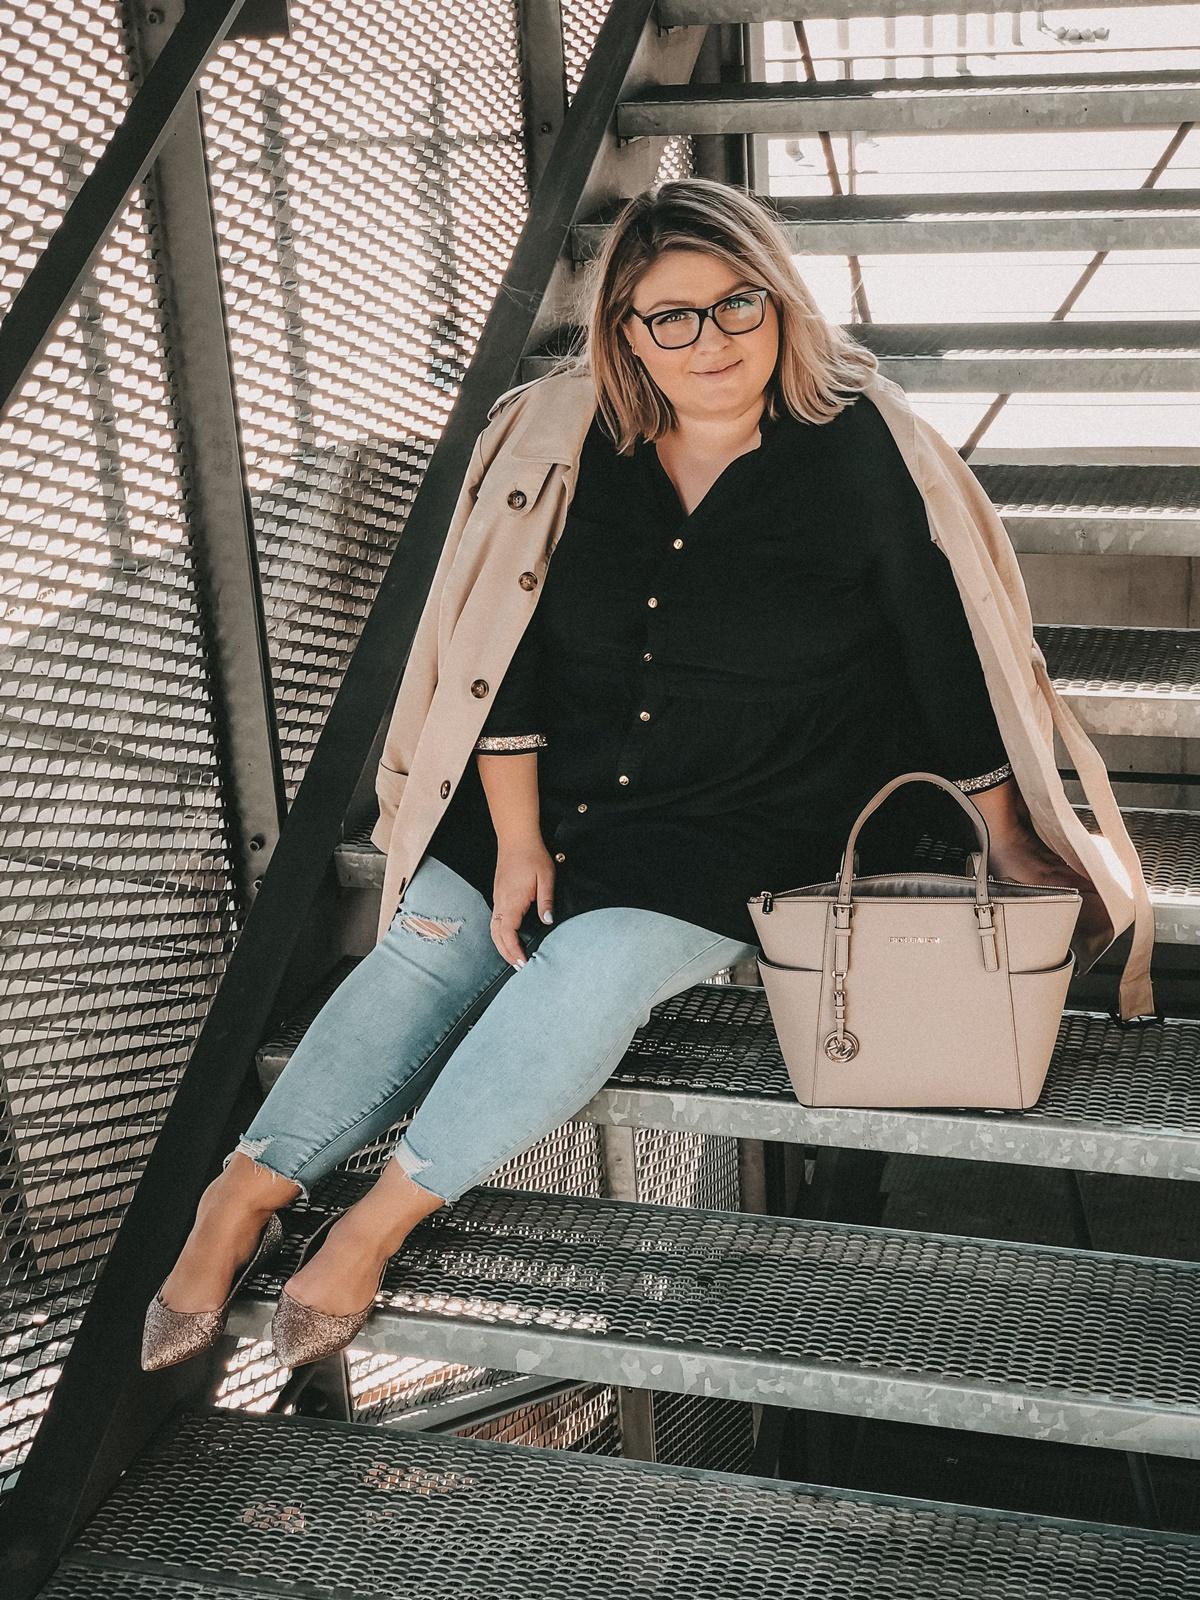 CITALEA Frühjahres Mode 2019 elabonbonella plus size fashion blog04